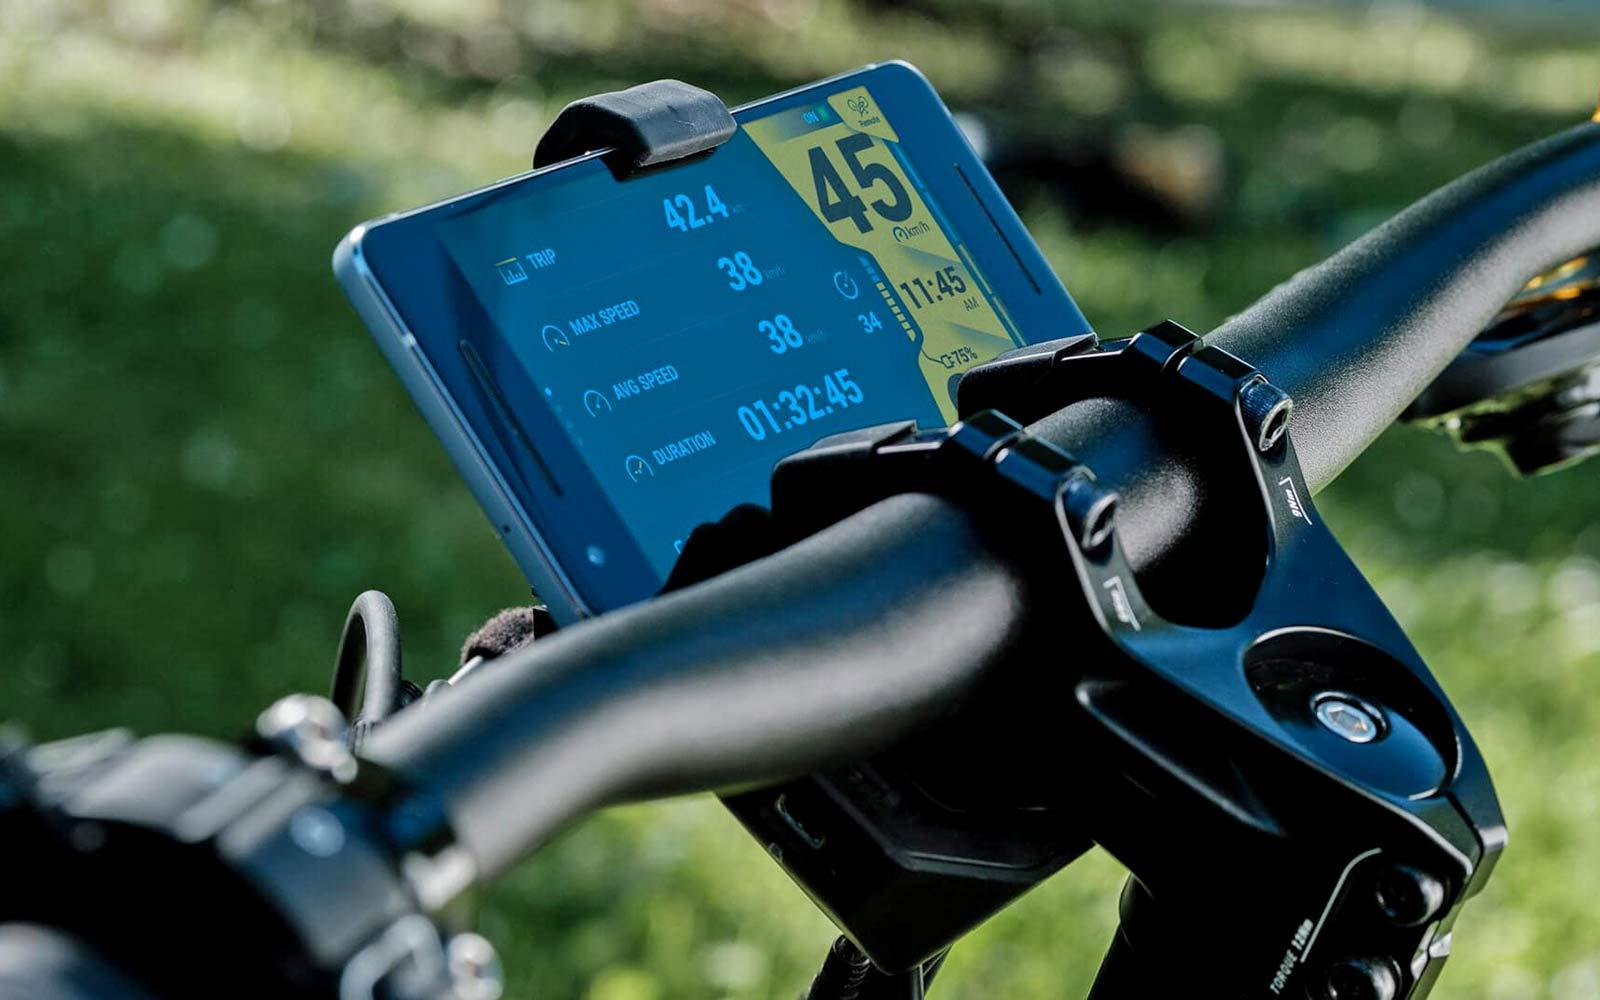 Greyp T5 alloy trekking e-bike hardtail eSUV mobile smartphone dashboard